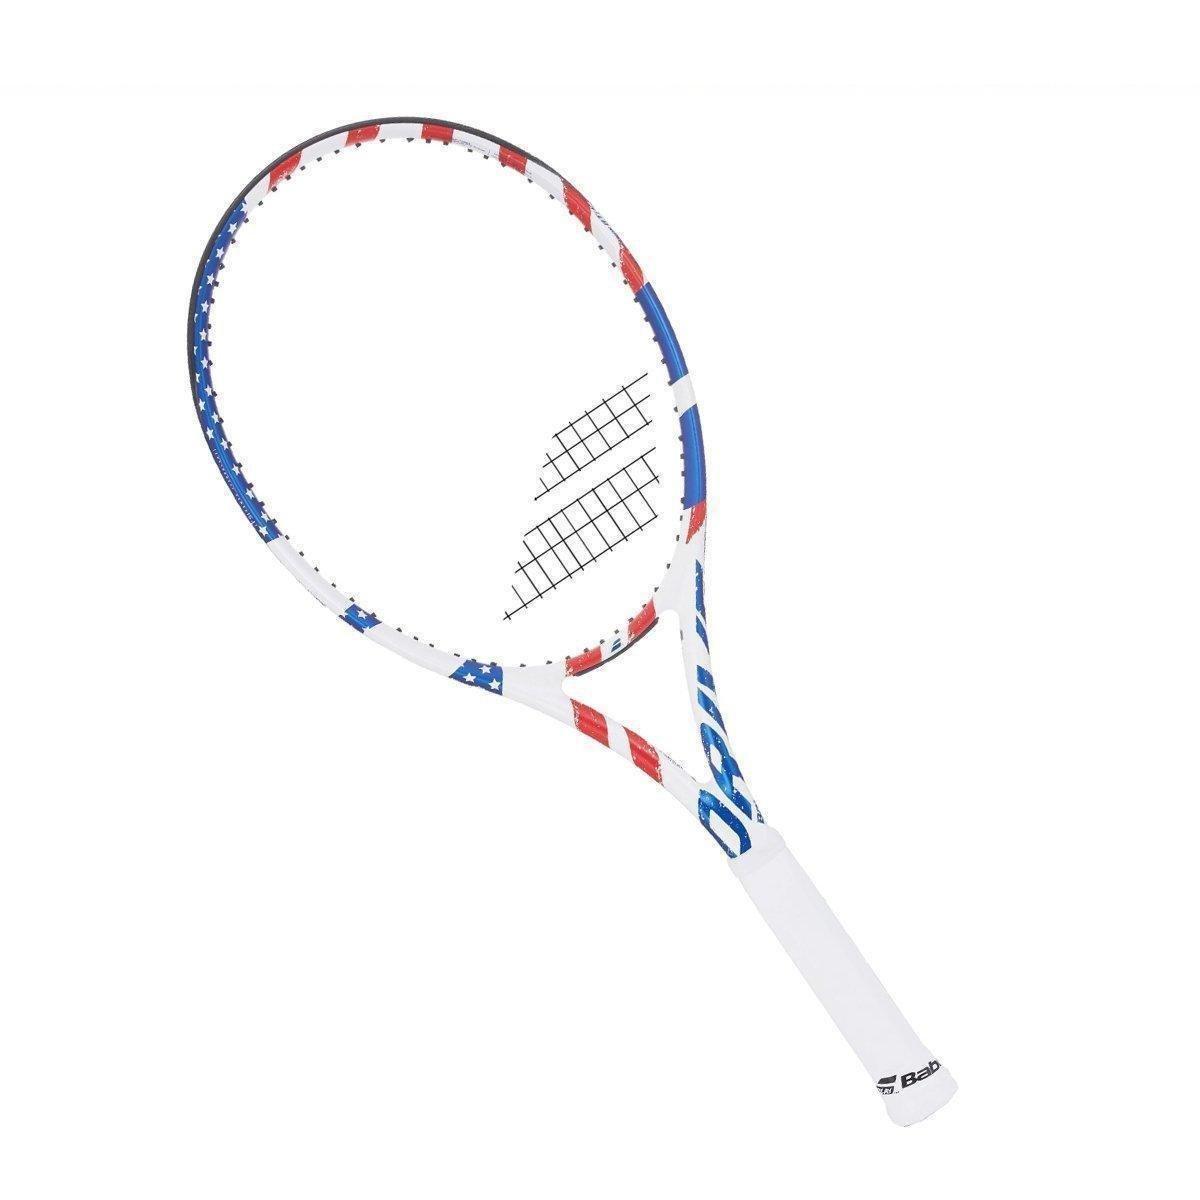 Raquete de Tênis Babolat Pure Drive USA Country L3